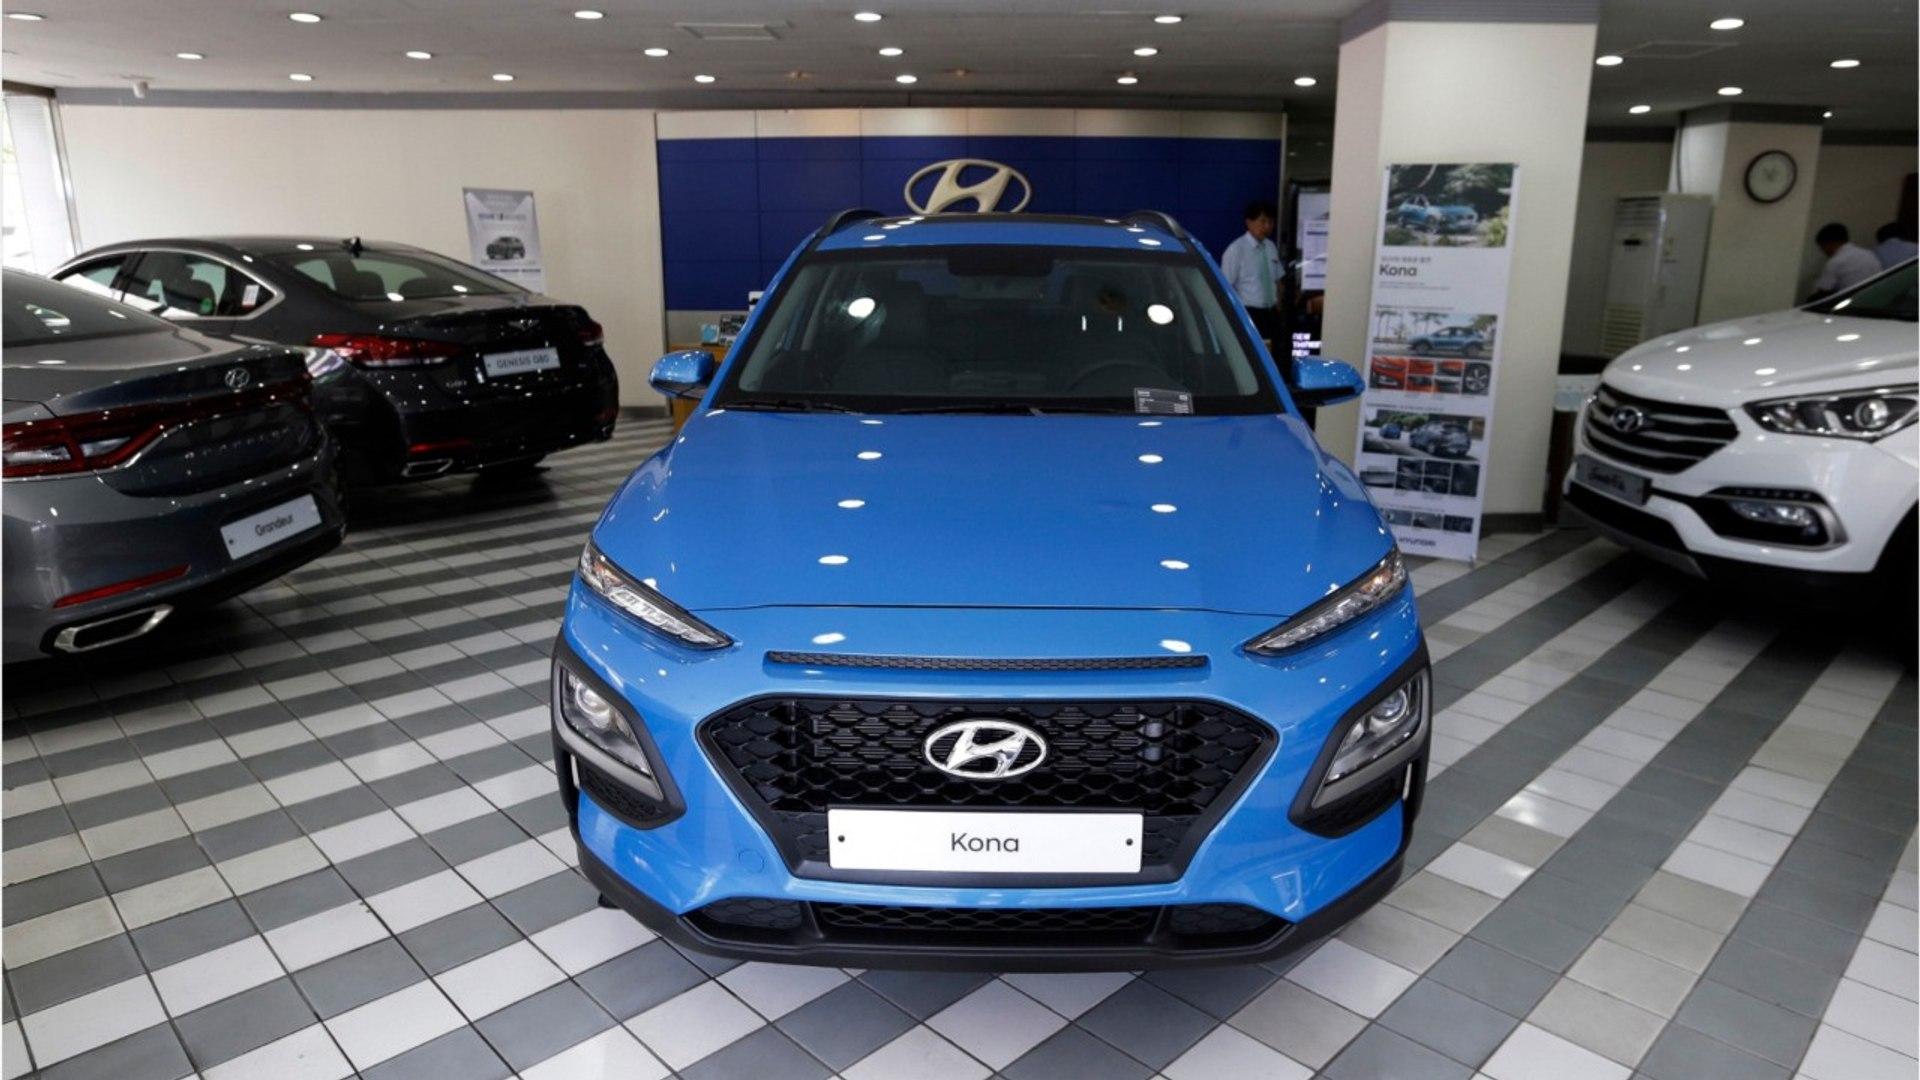 Hyundai's 5-Year Plan: $40 Billion On New Models, Tech